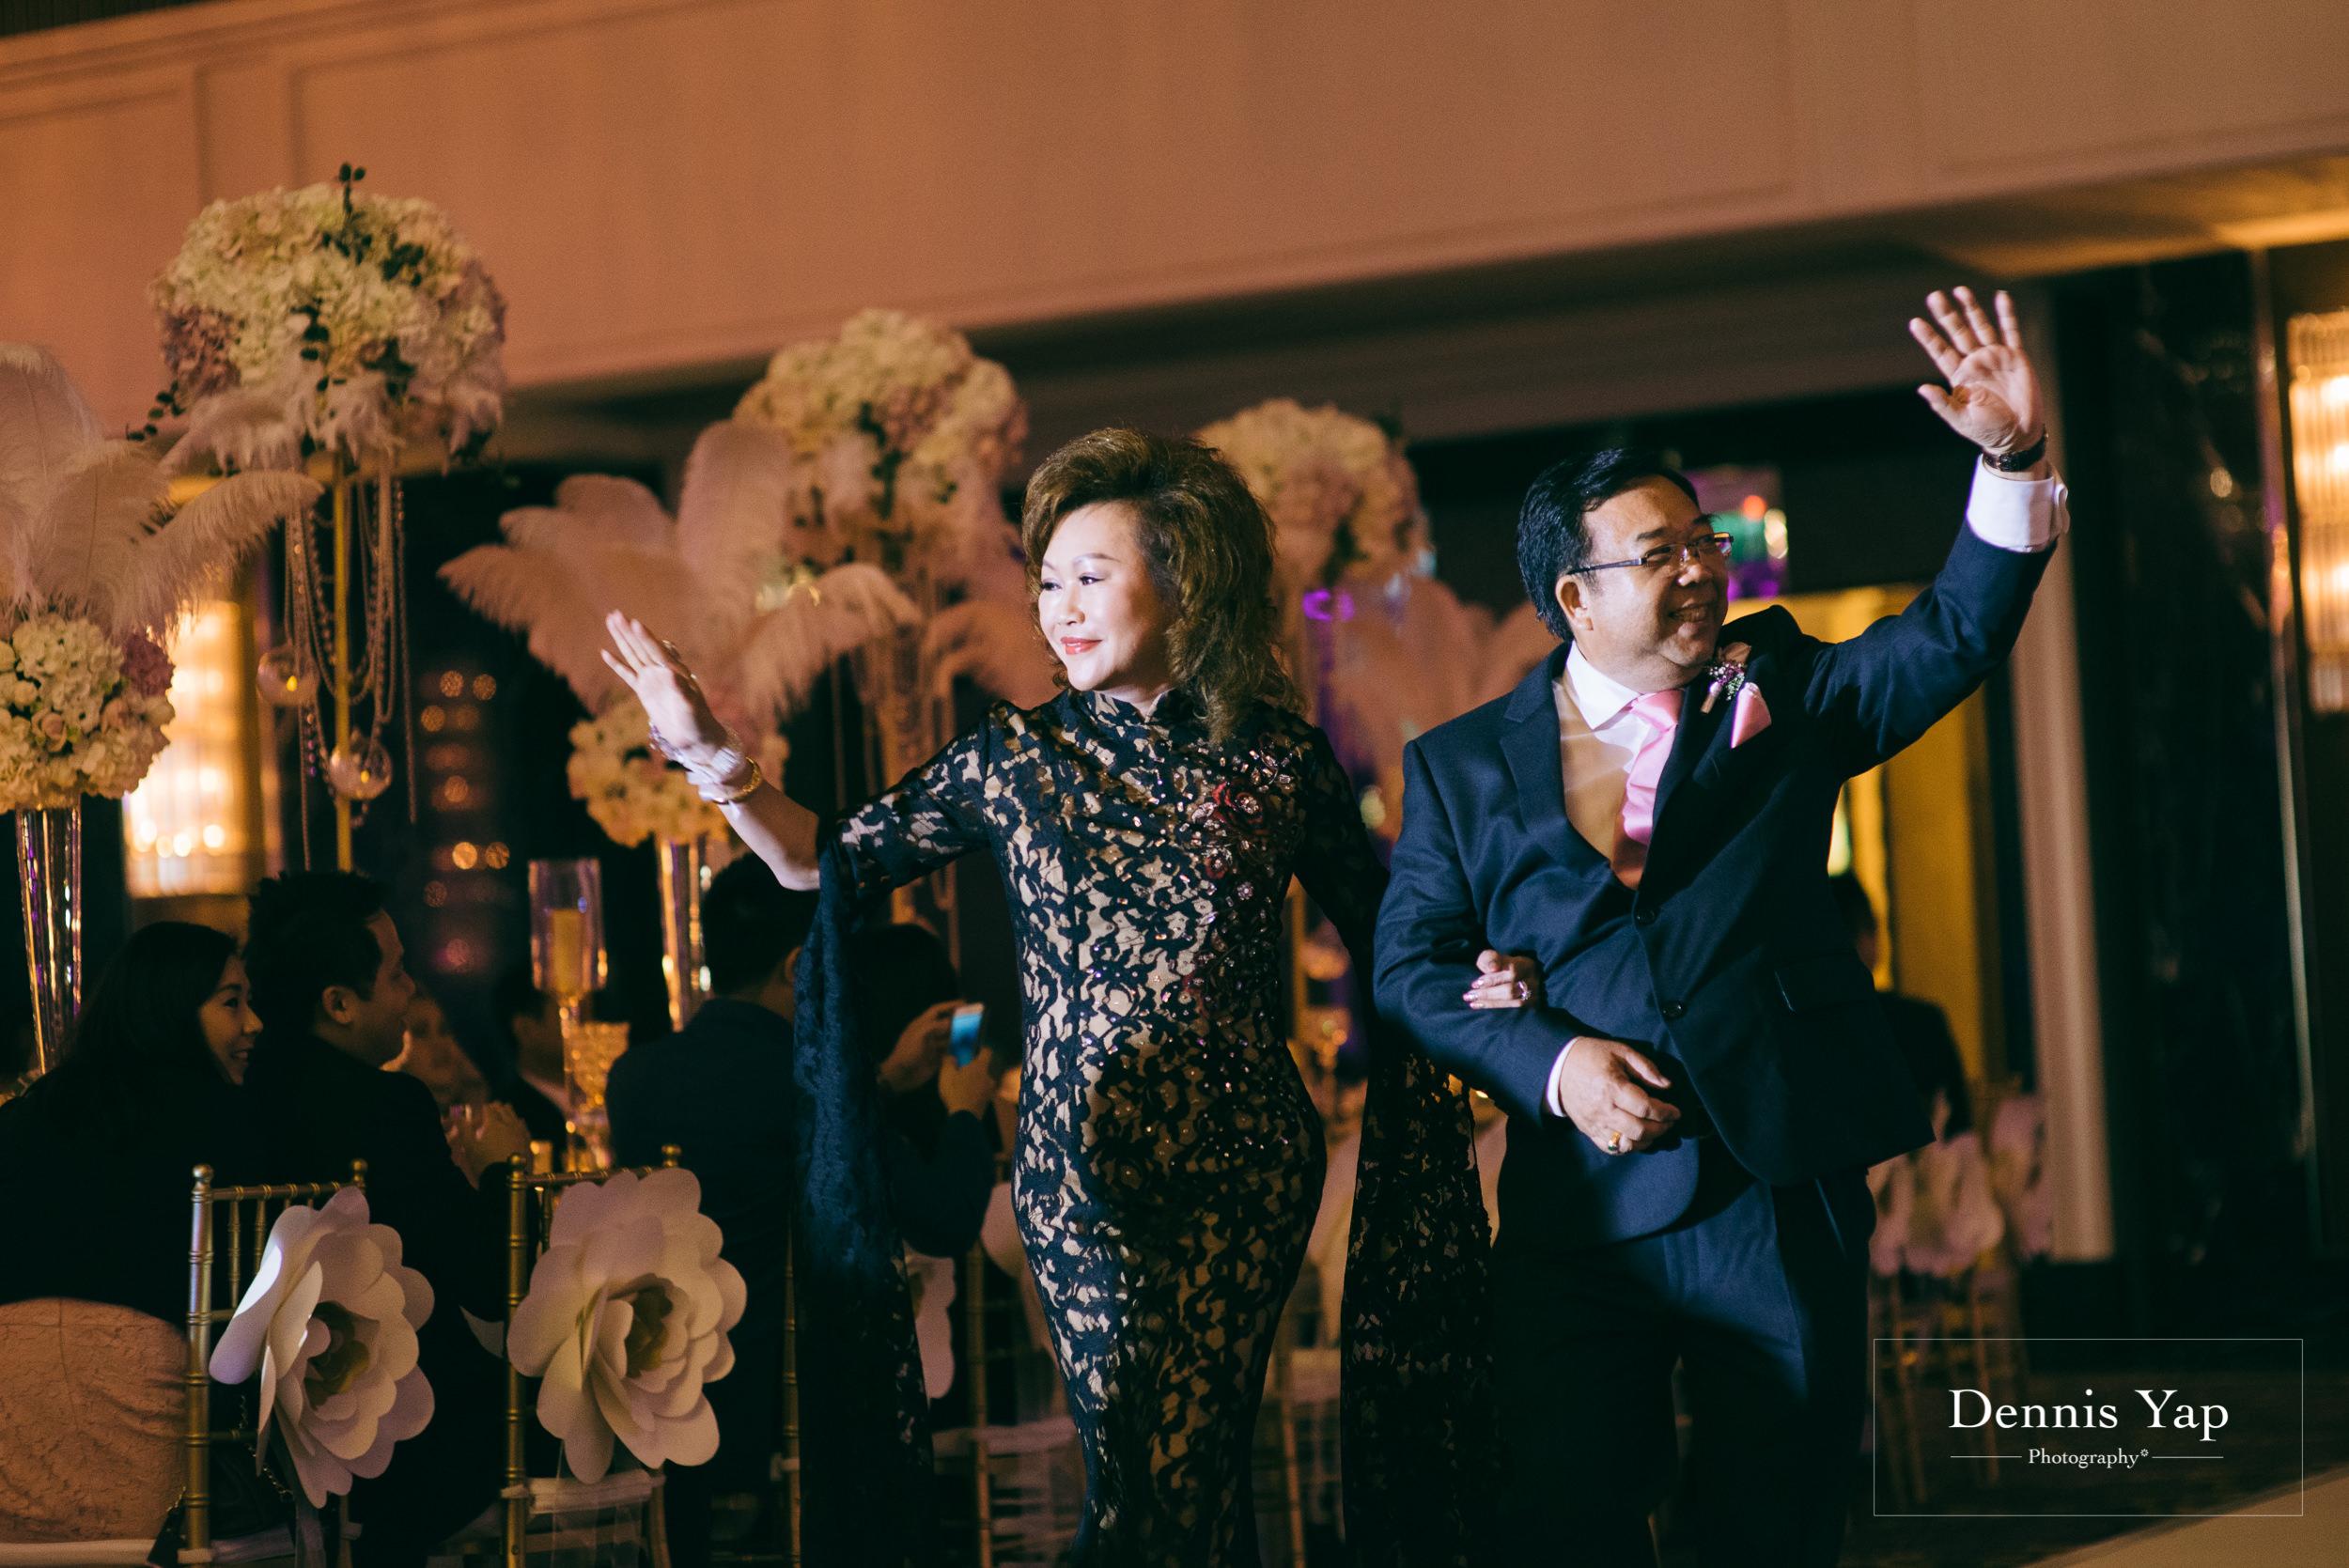 lionel joanne garden wedding majestic hotel dennis yap photography malaysia top wedding photographer-76.jpg